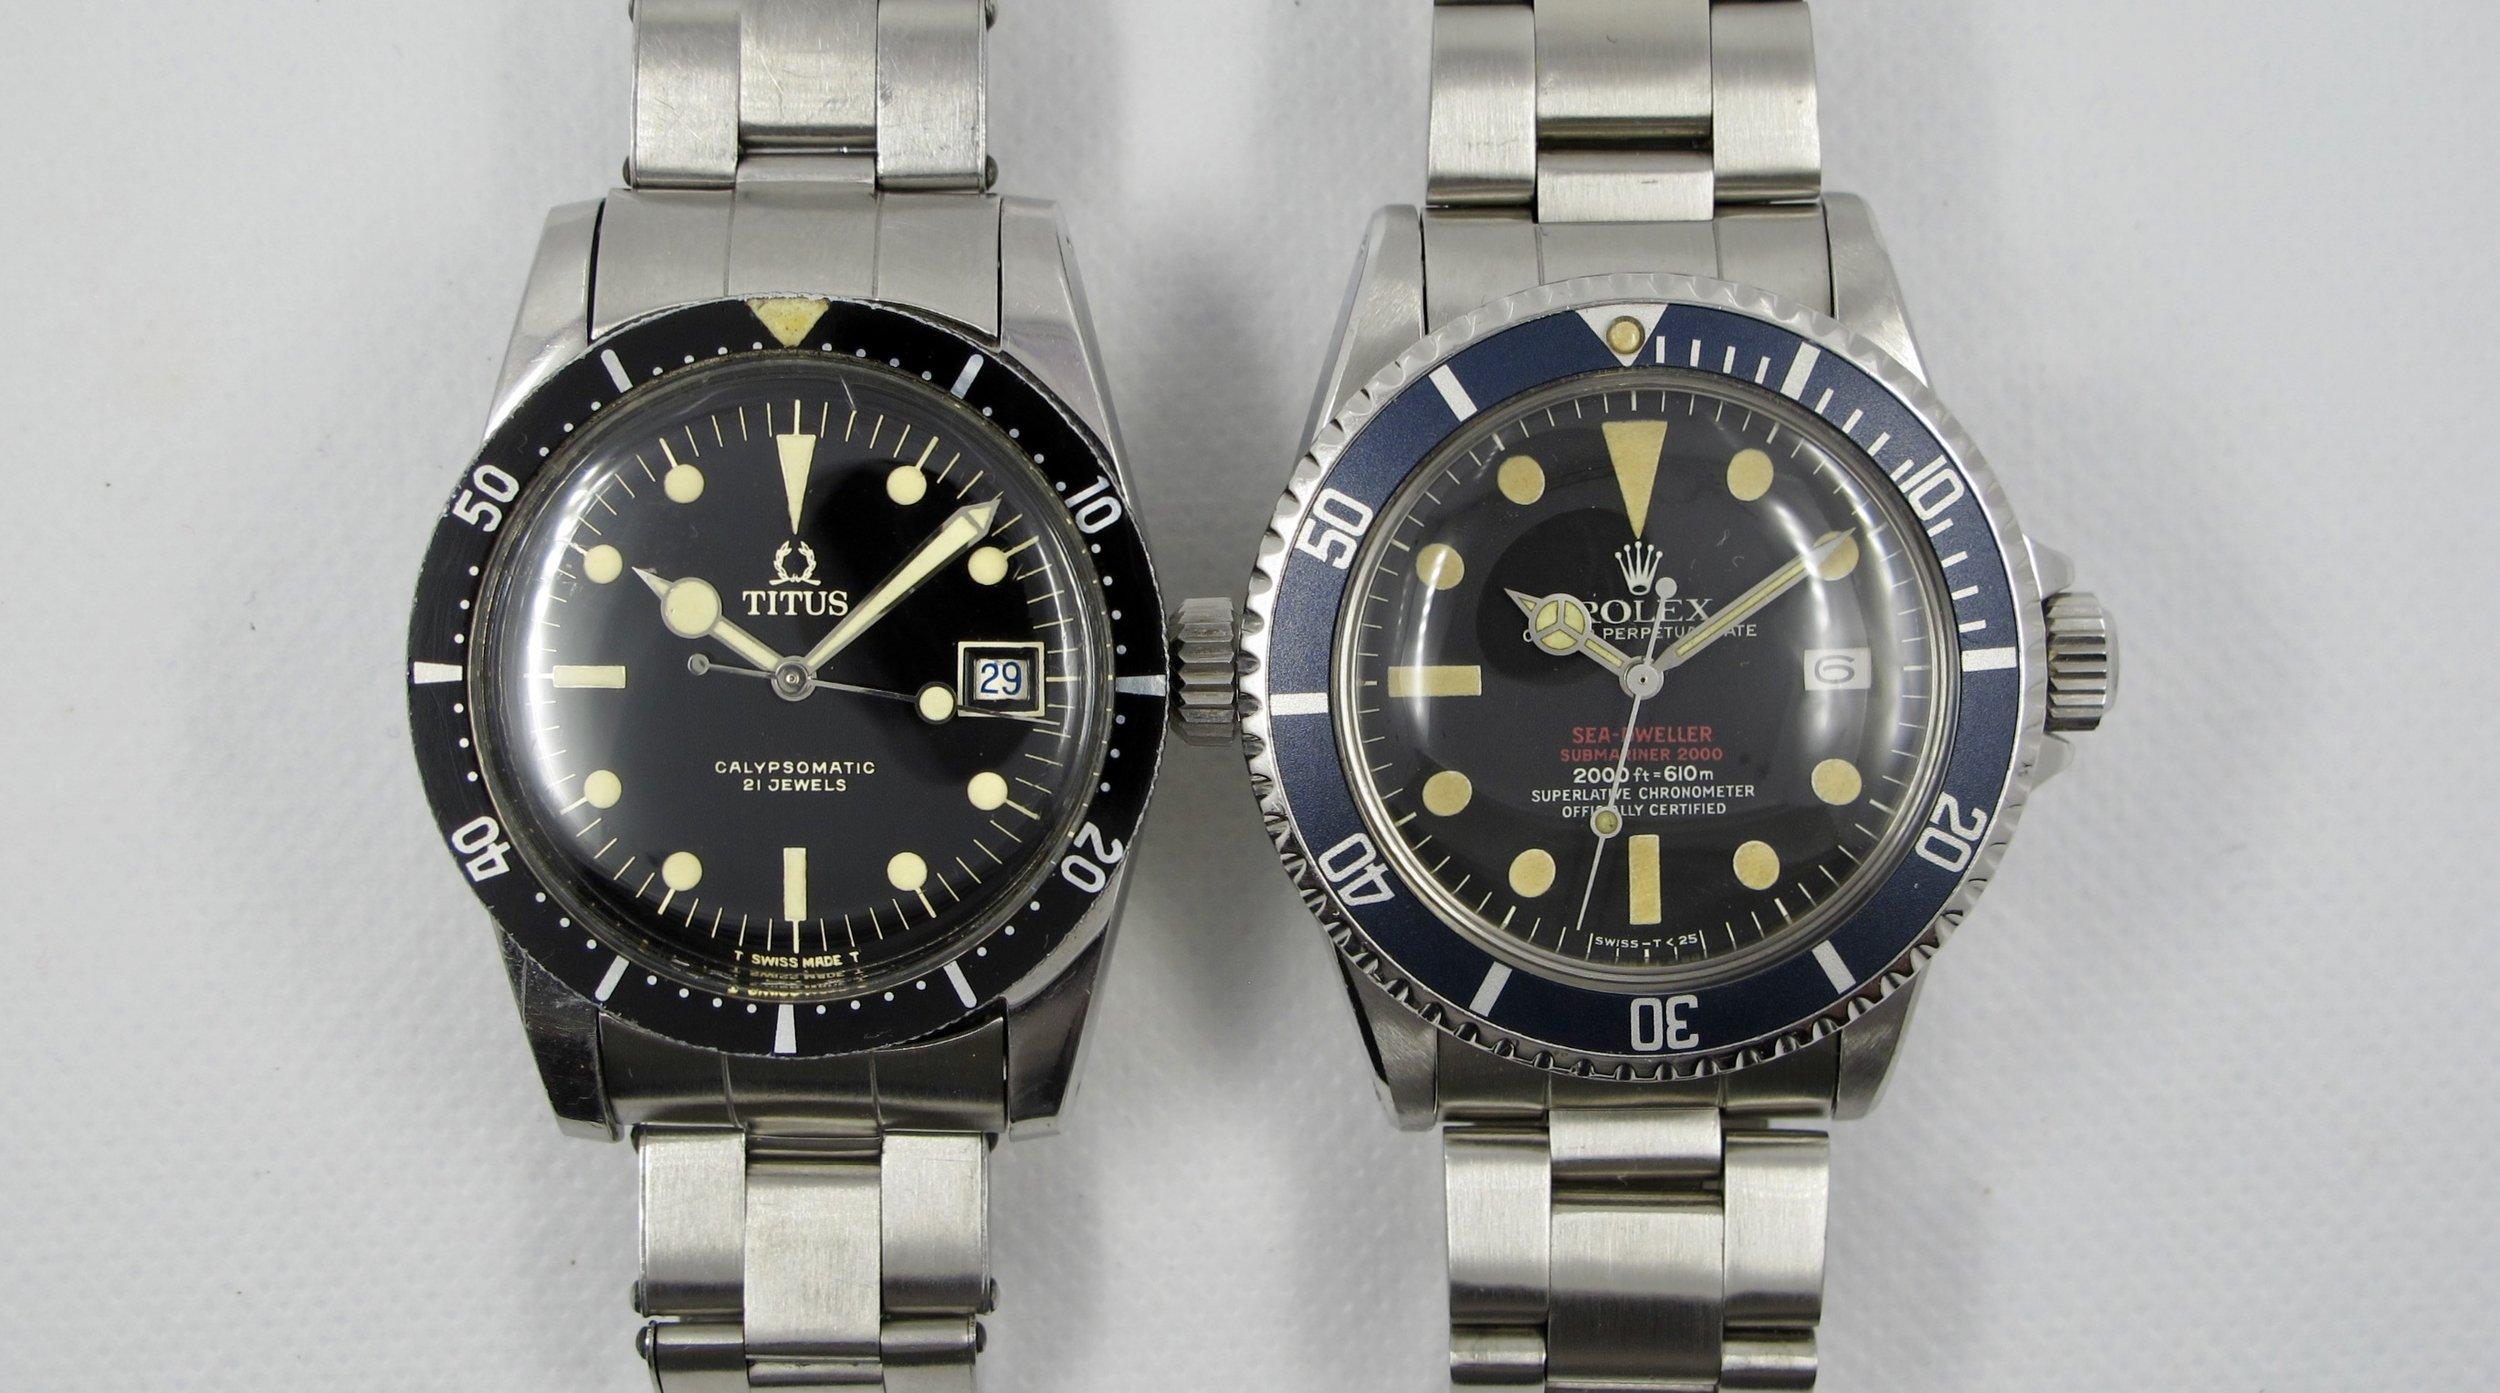 Long lugs help the watch wear much bigger than the list diameter.